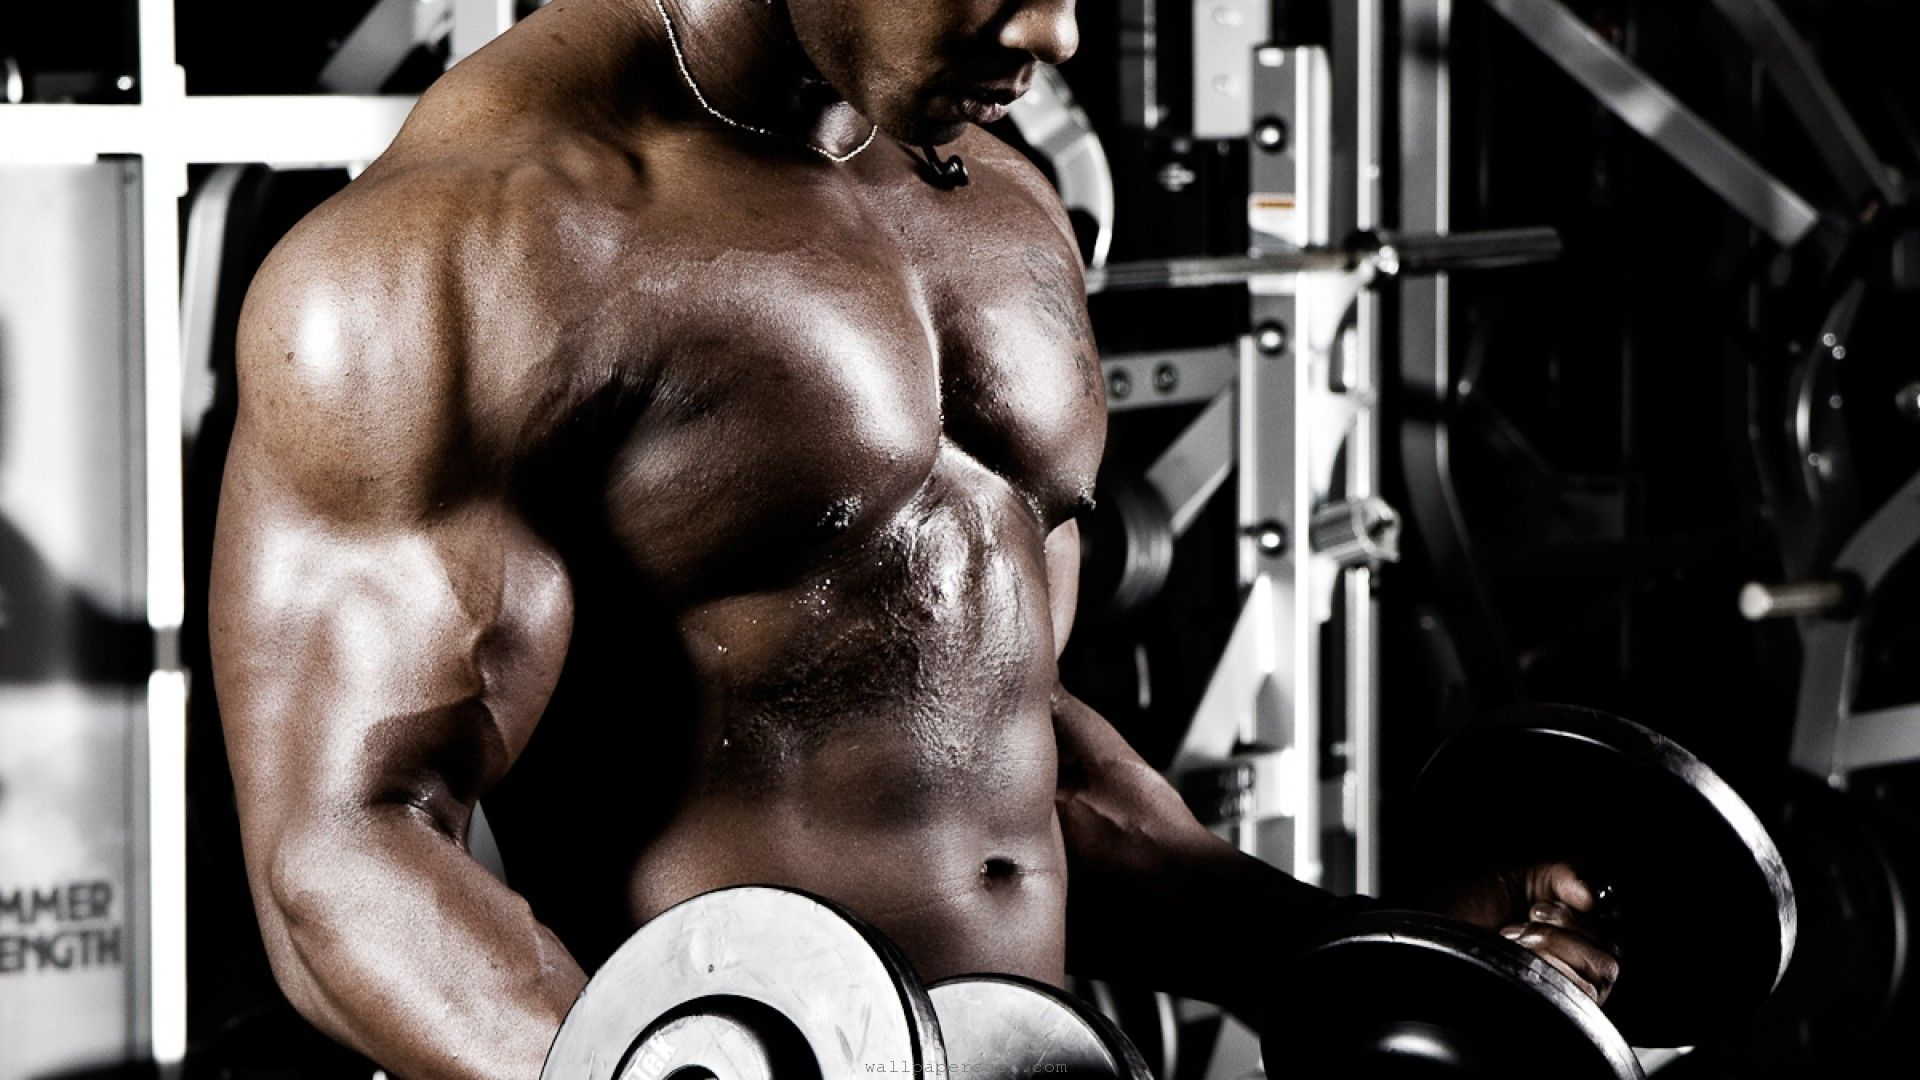 workout motivational pics